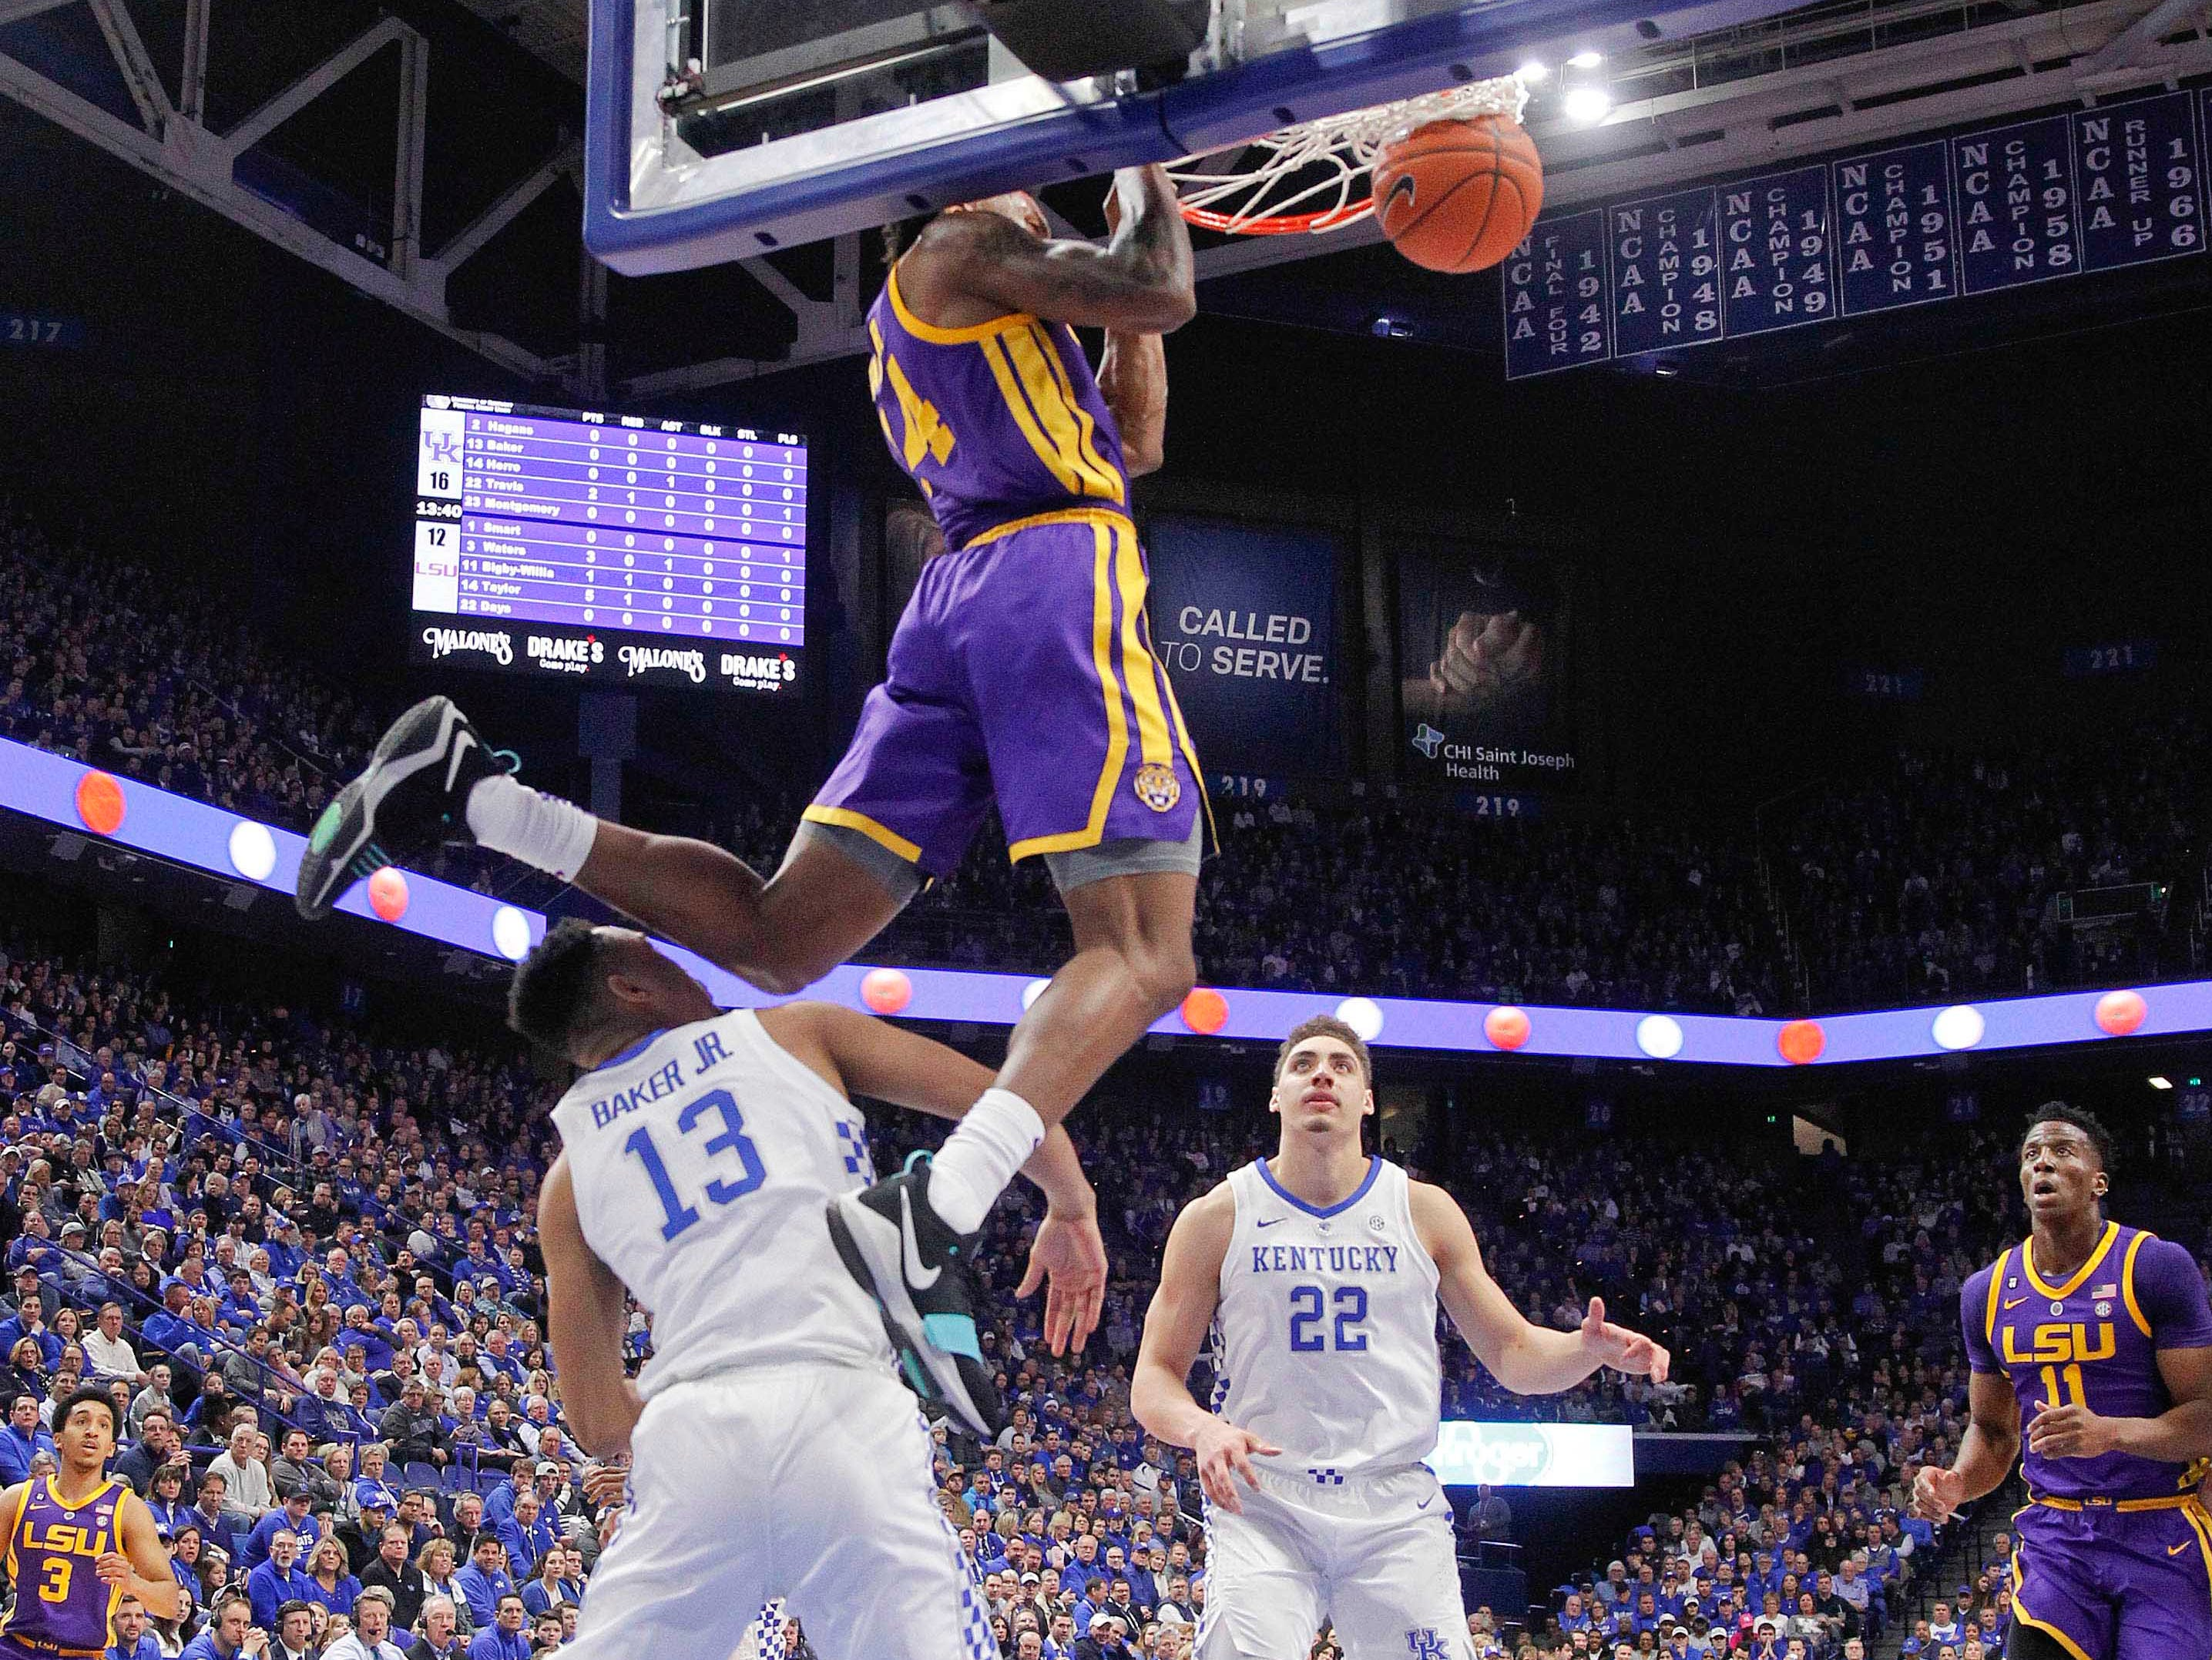 Feb 12, 2019; Lexington, KY, USA; LSU Tigers guard Marlon Taylor (14) dunks the ball against Kentucky Wildcats guard Jemarl Baker (13) in the second half at Rupp Arena. Mandatory Credit: Mark Zerof-USA TODAY Sports